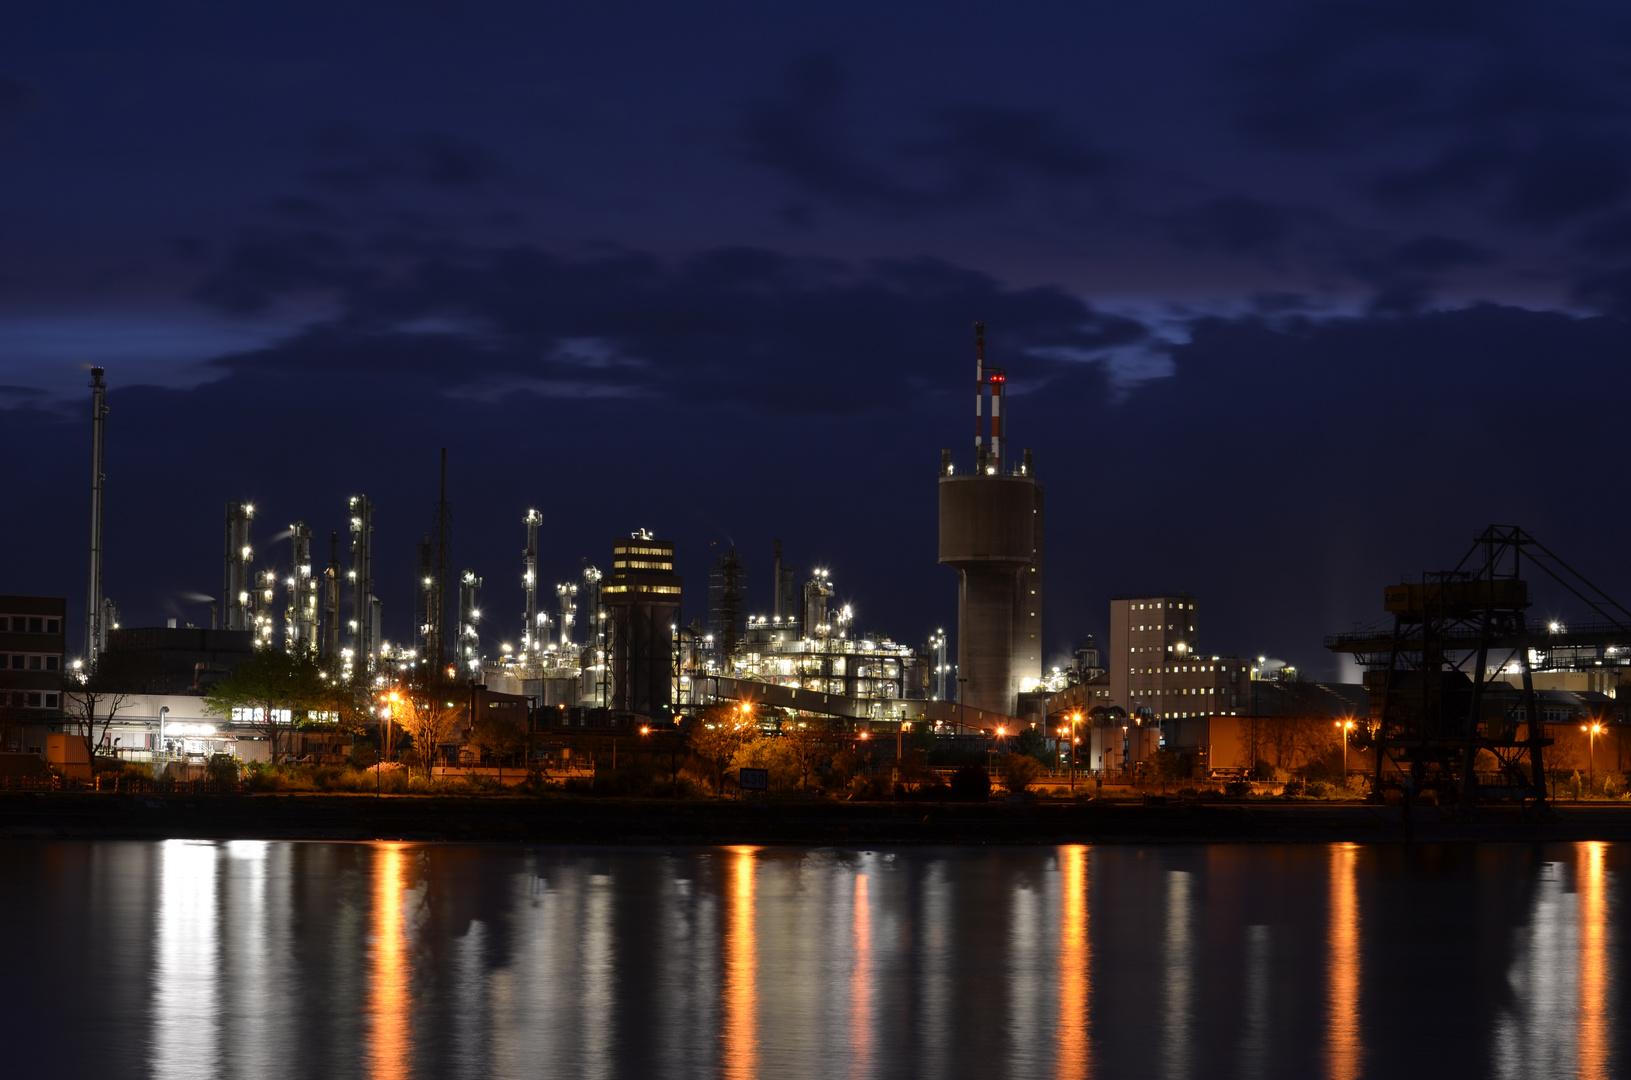 BASF bei Nacht 1